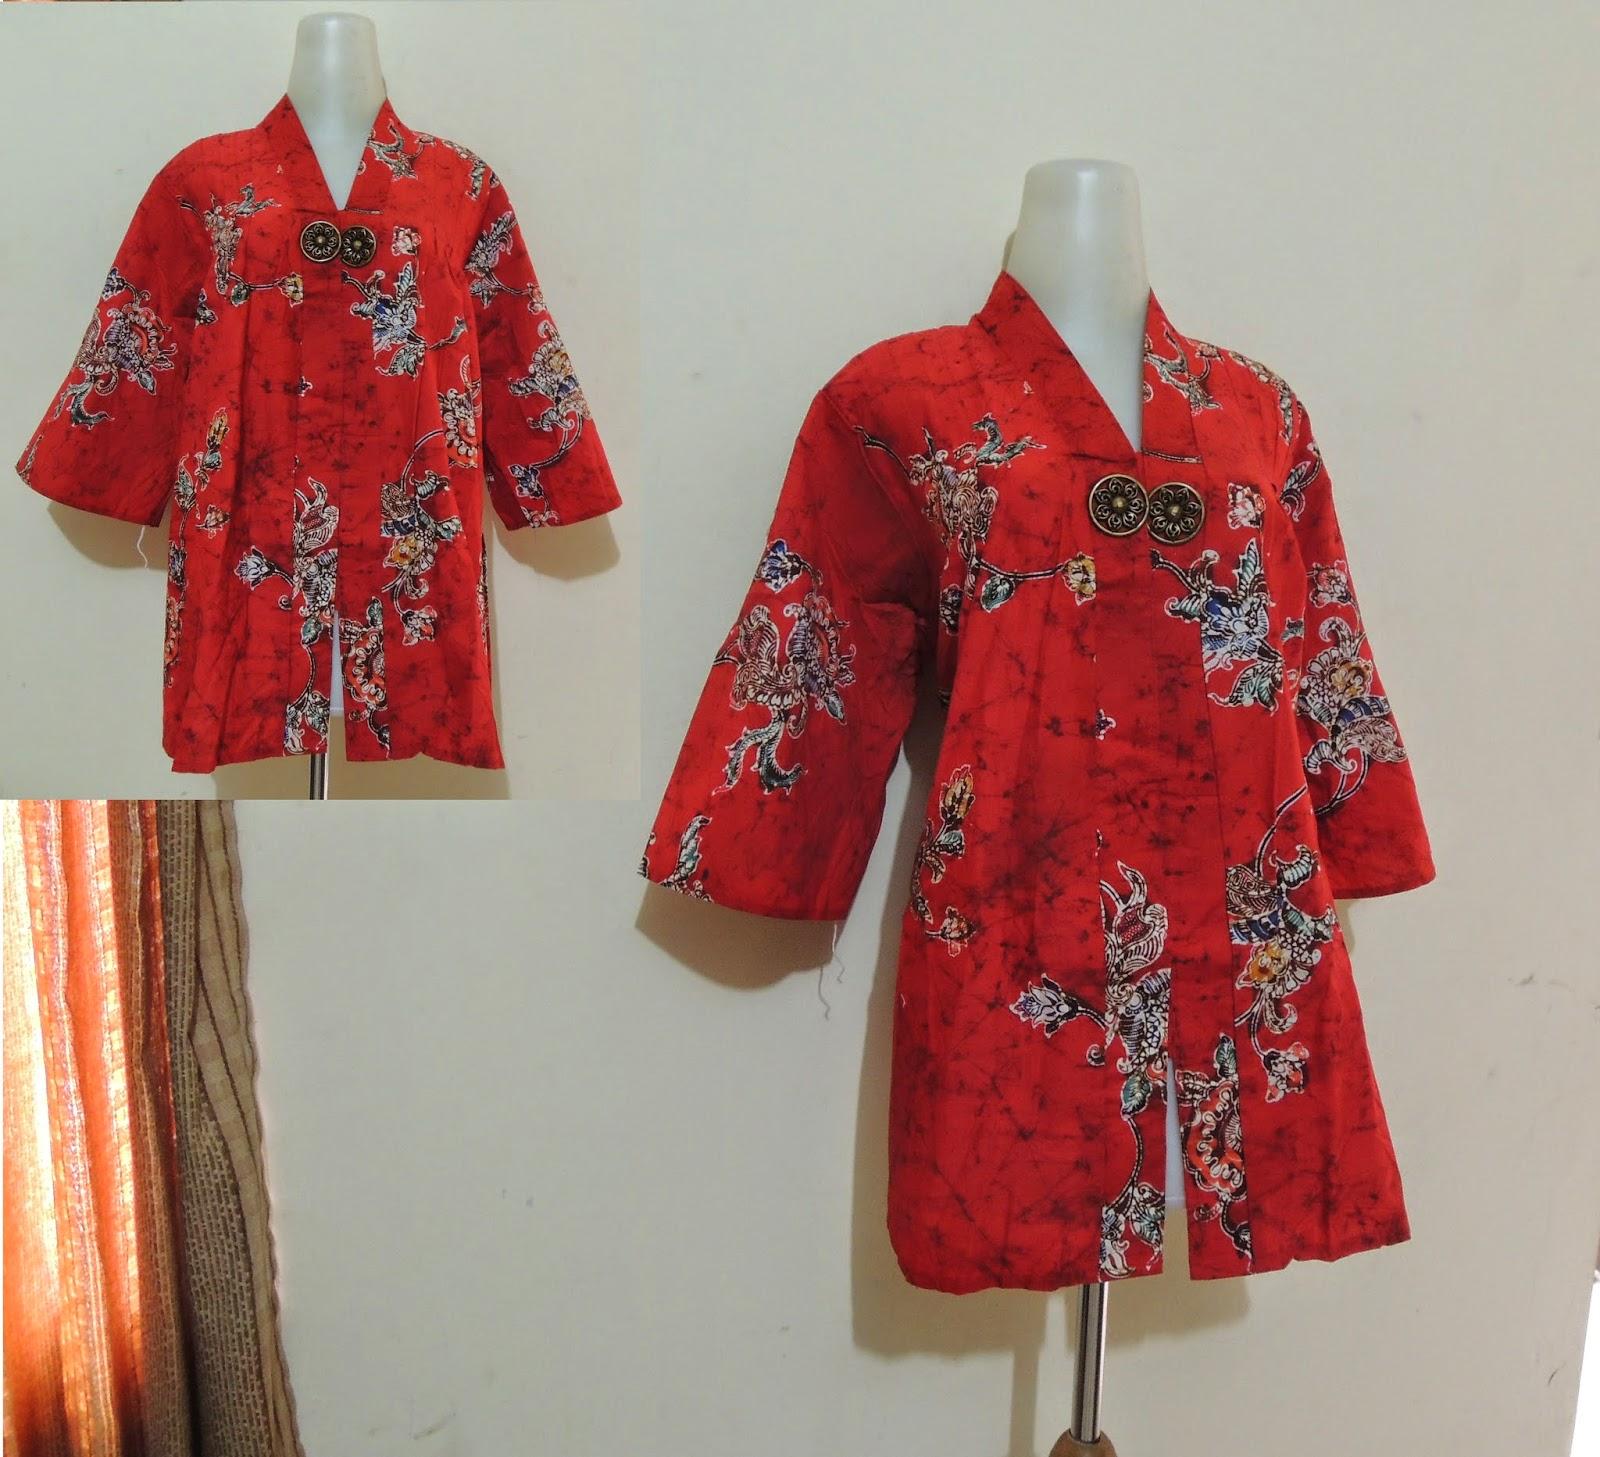 Batik Keris Warna Merah: Palastri Shop & Gabriella Shop: 2 Blus Wanita Bigsize